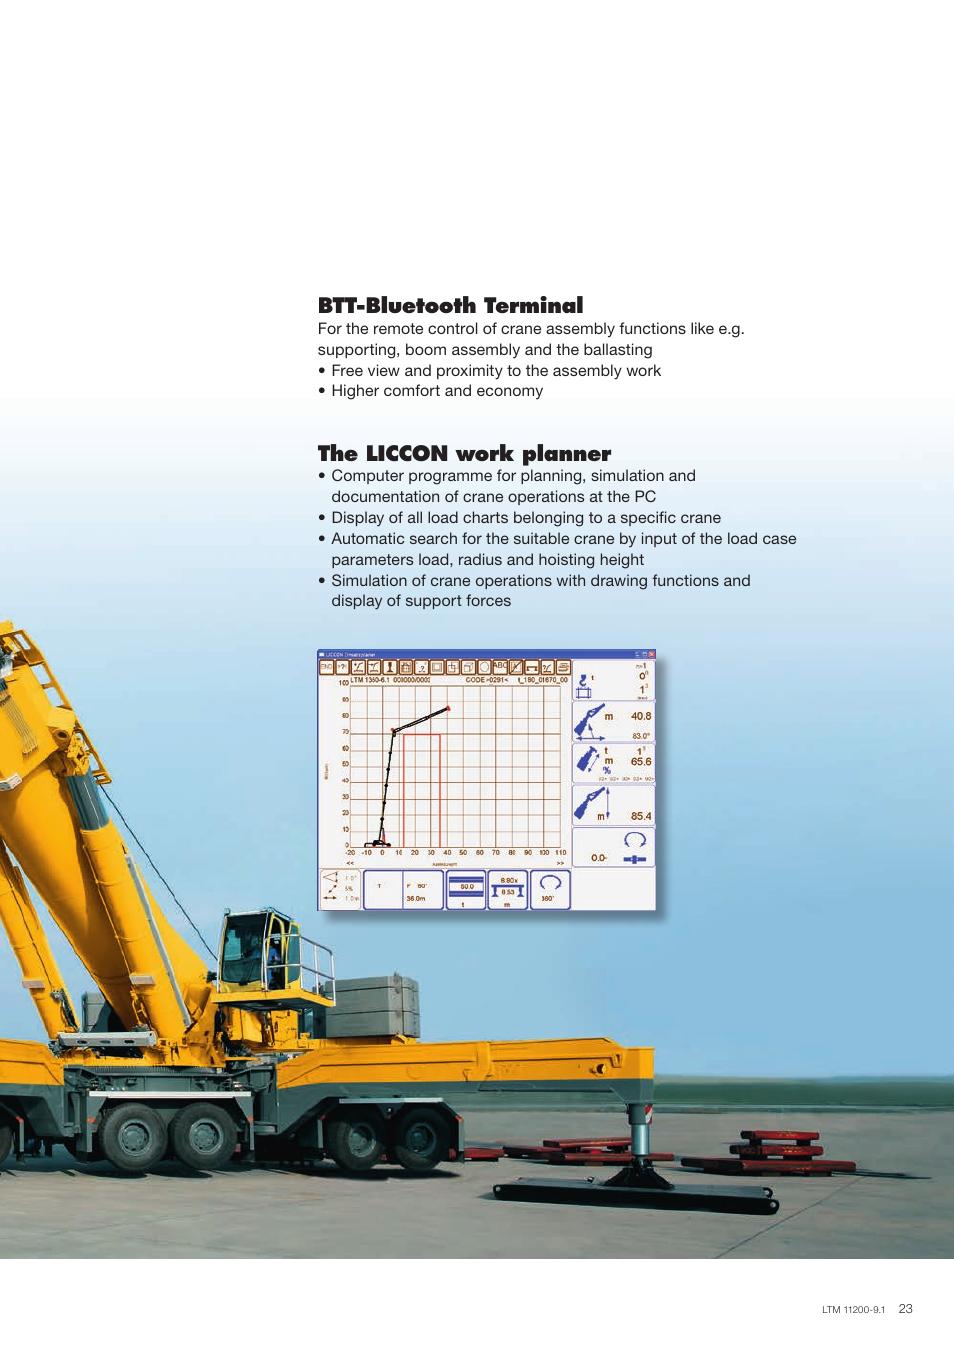 Btt-bluetooth terminal, The liccon work planner | Liebherr LTM 11200-9.1  User Manual | Page 23 / 24